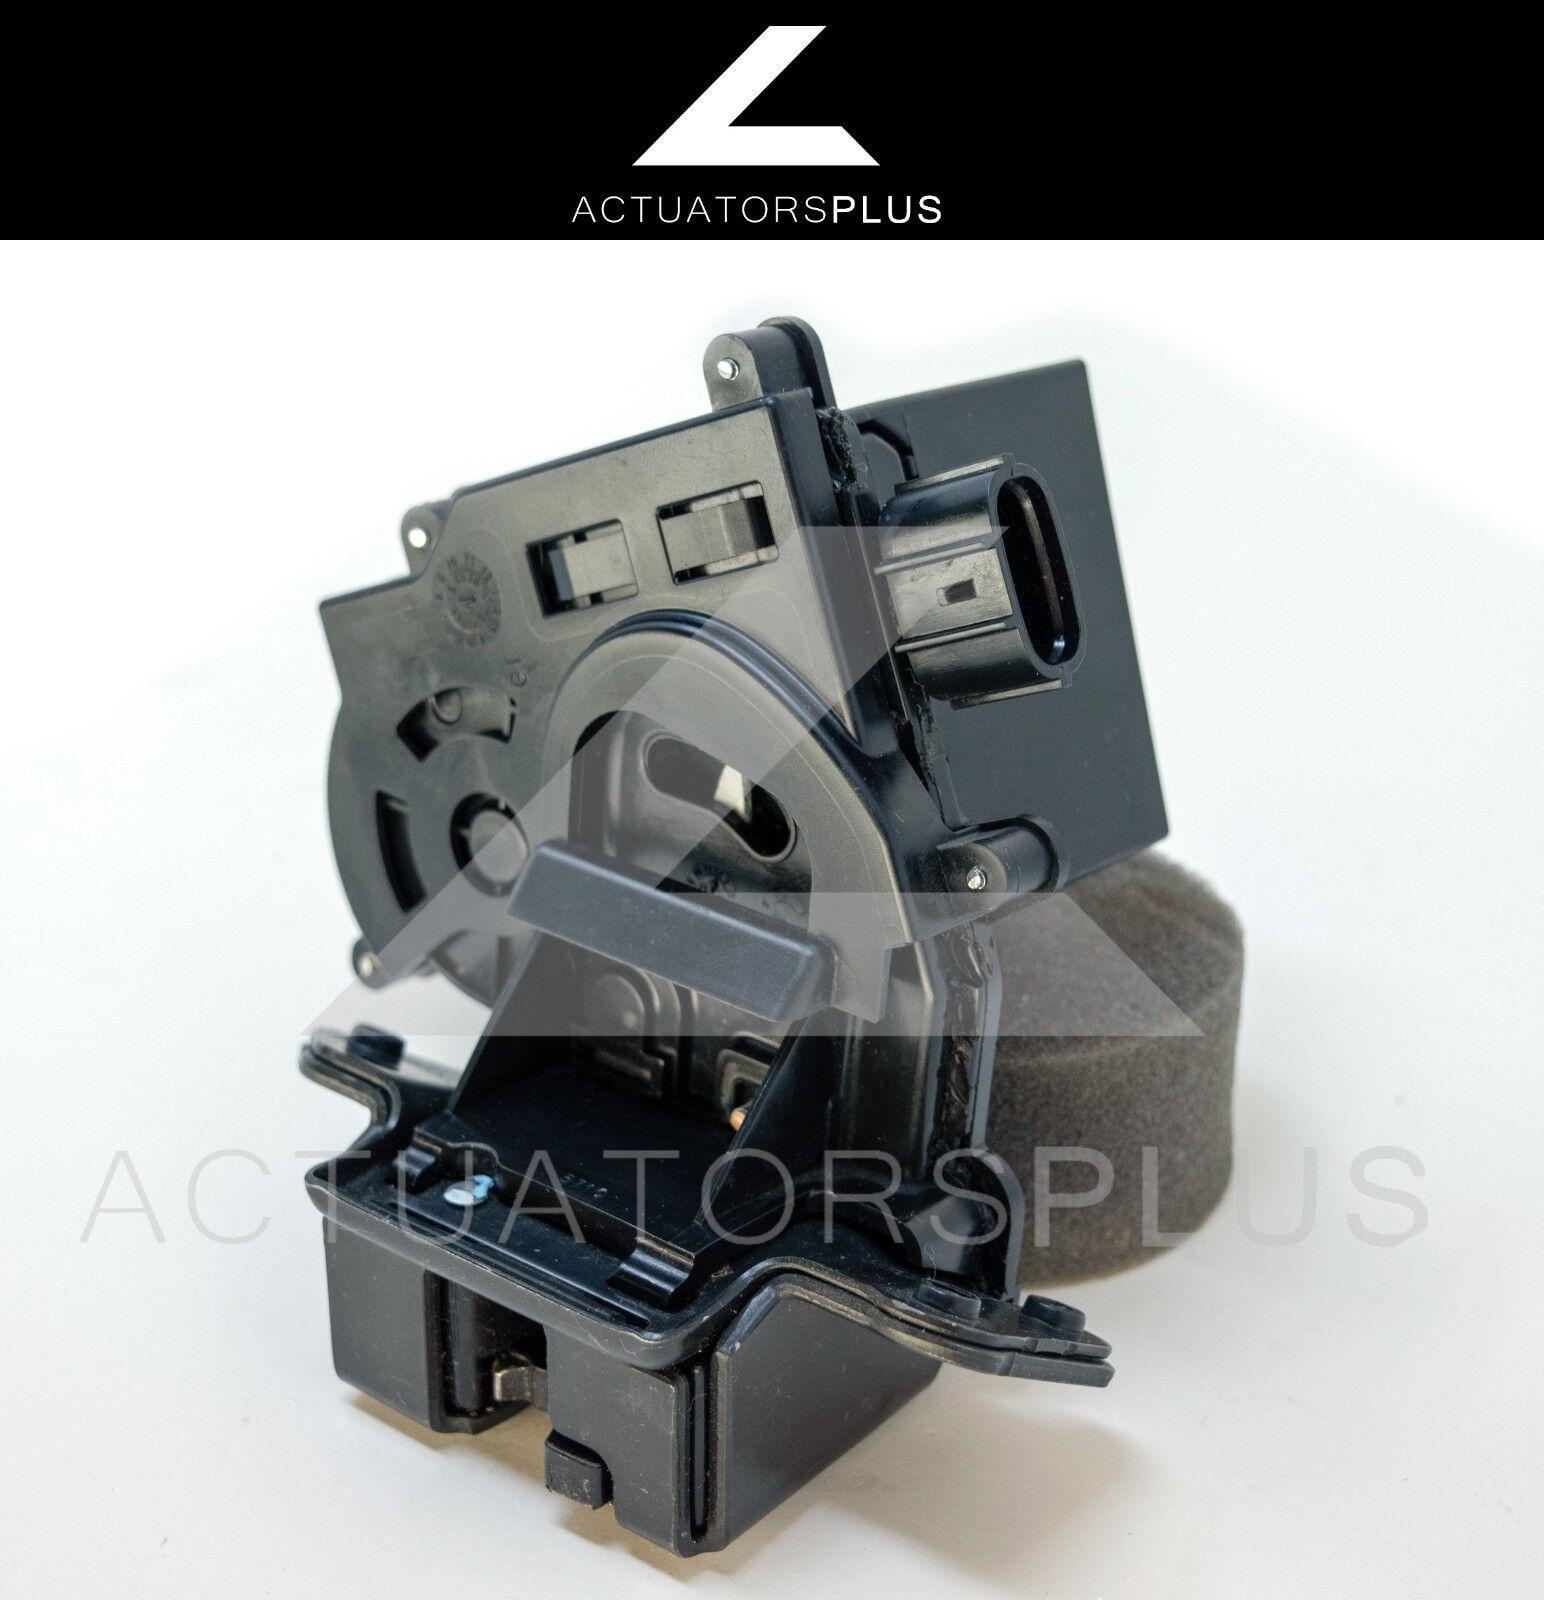 Toyota Sienna OEM Liftgate Trunk Hatch Tailgate Door Lock Actuator 11-17